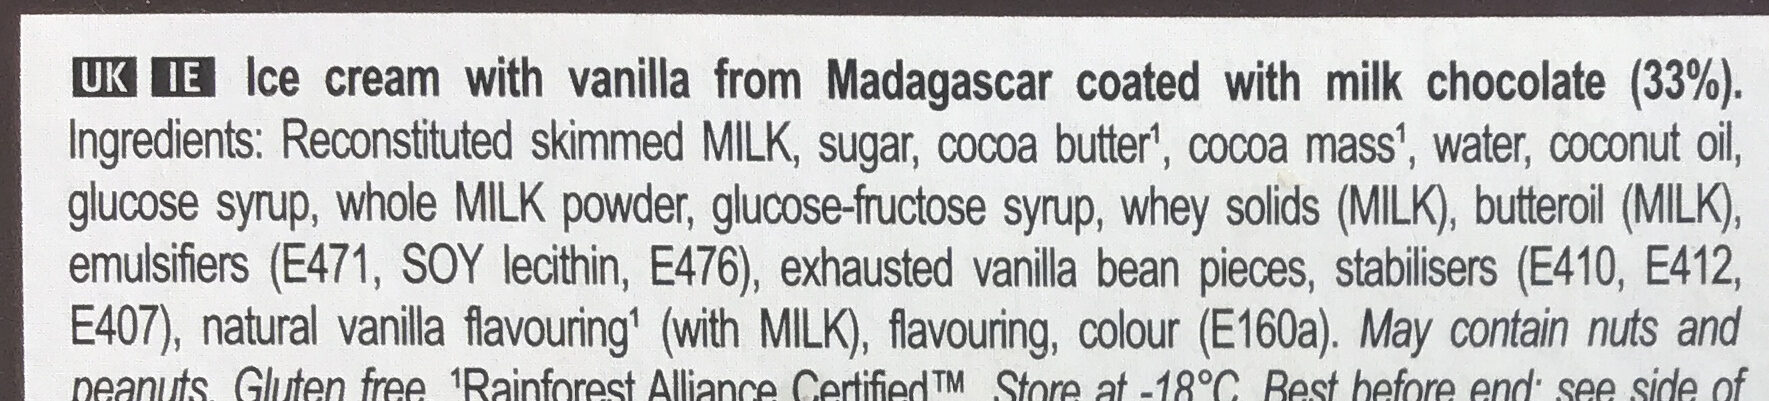 Magnum Batonnet Glace Classic x6 330ml - Ingredients